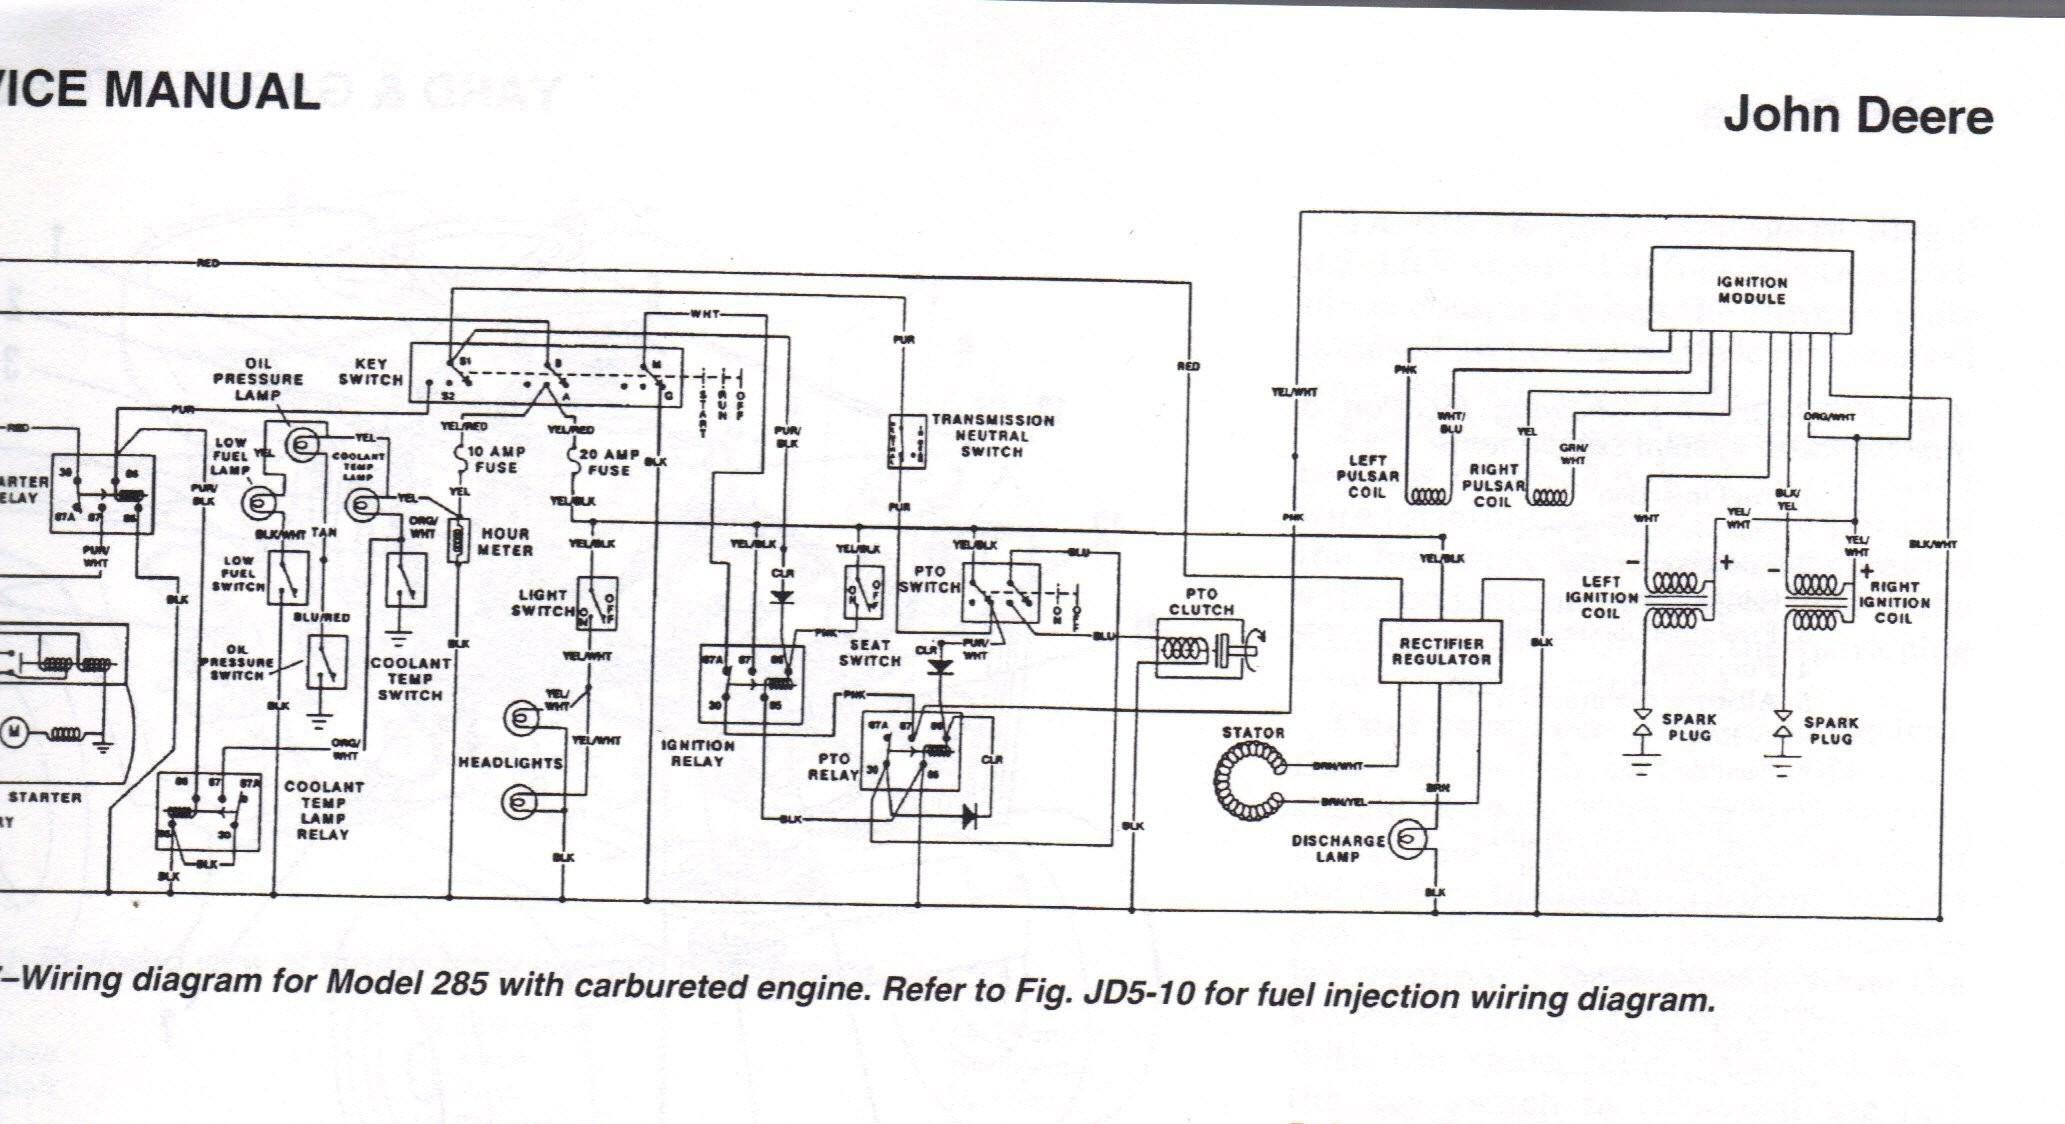 John Deere D140 Electrical Schematic John Deere D140 Wiring Diagram Of John Deere D140 Electrical Schematic